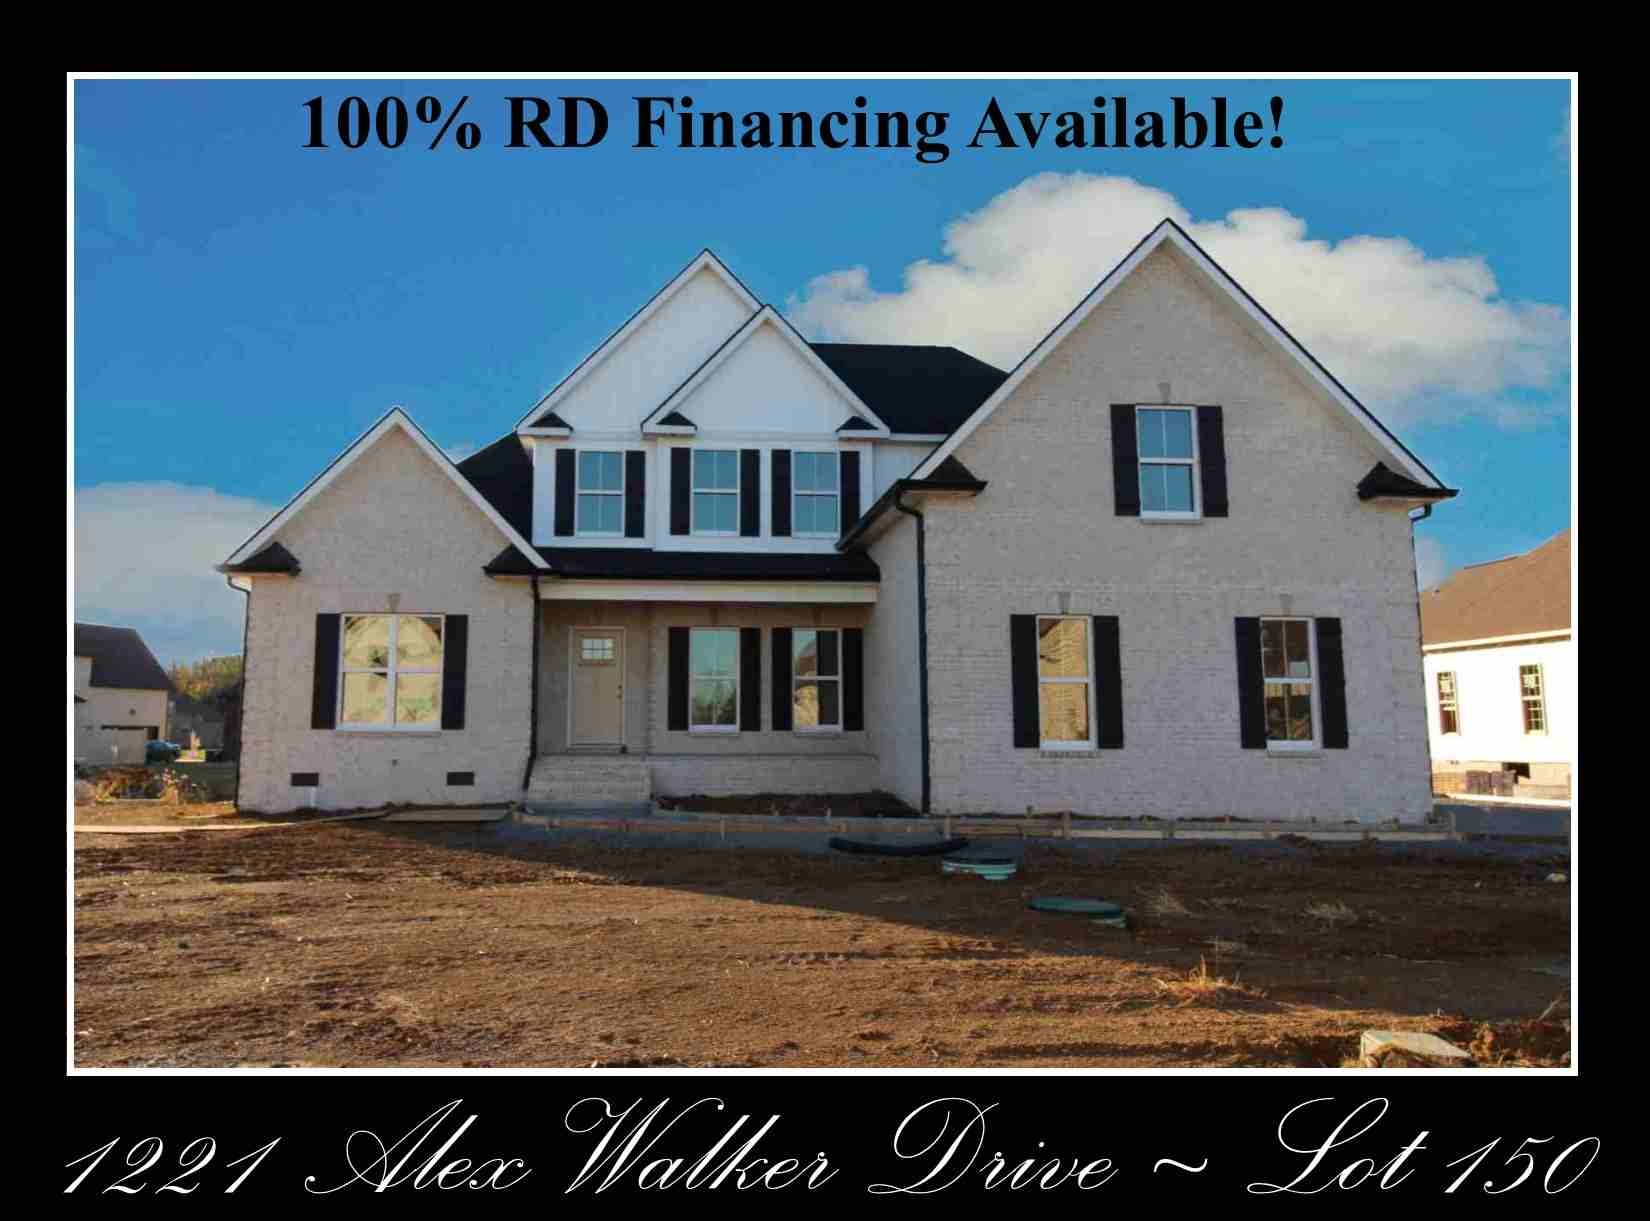 1221 Alex Walker Dr - Lot 150, Christiana, TN 37037 - Christiana, TN real estate listing